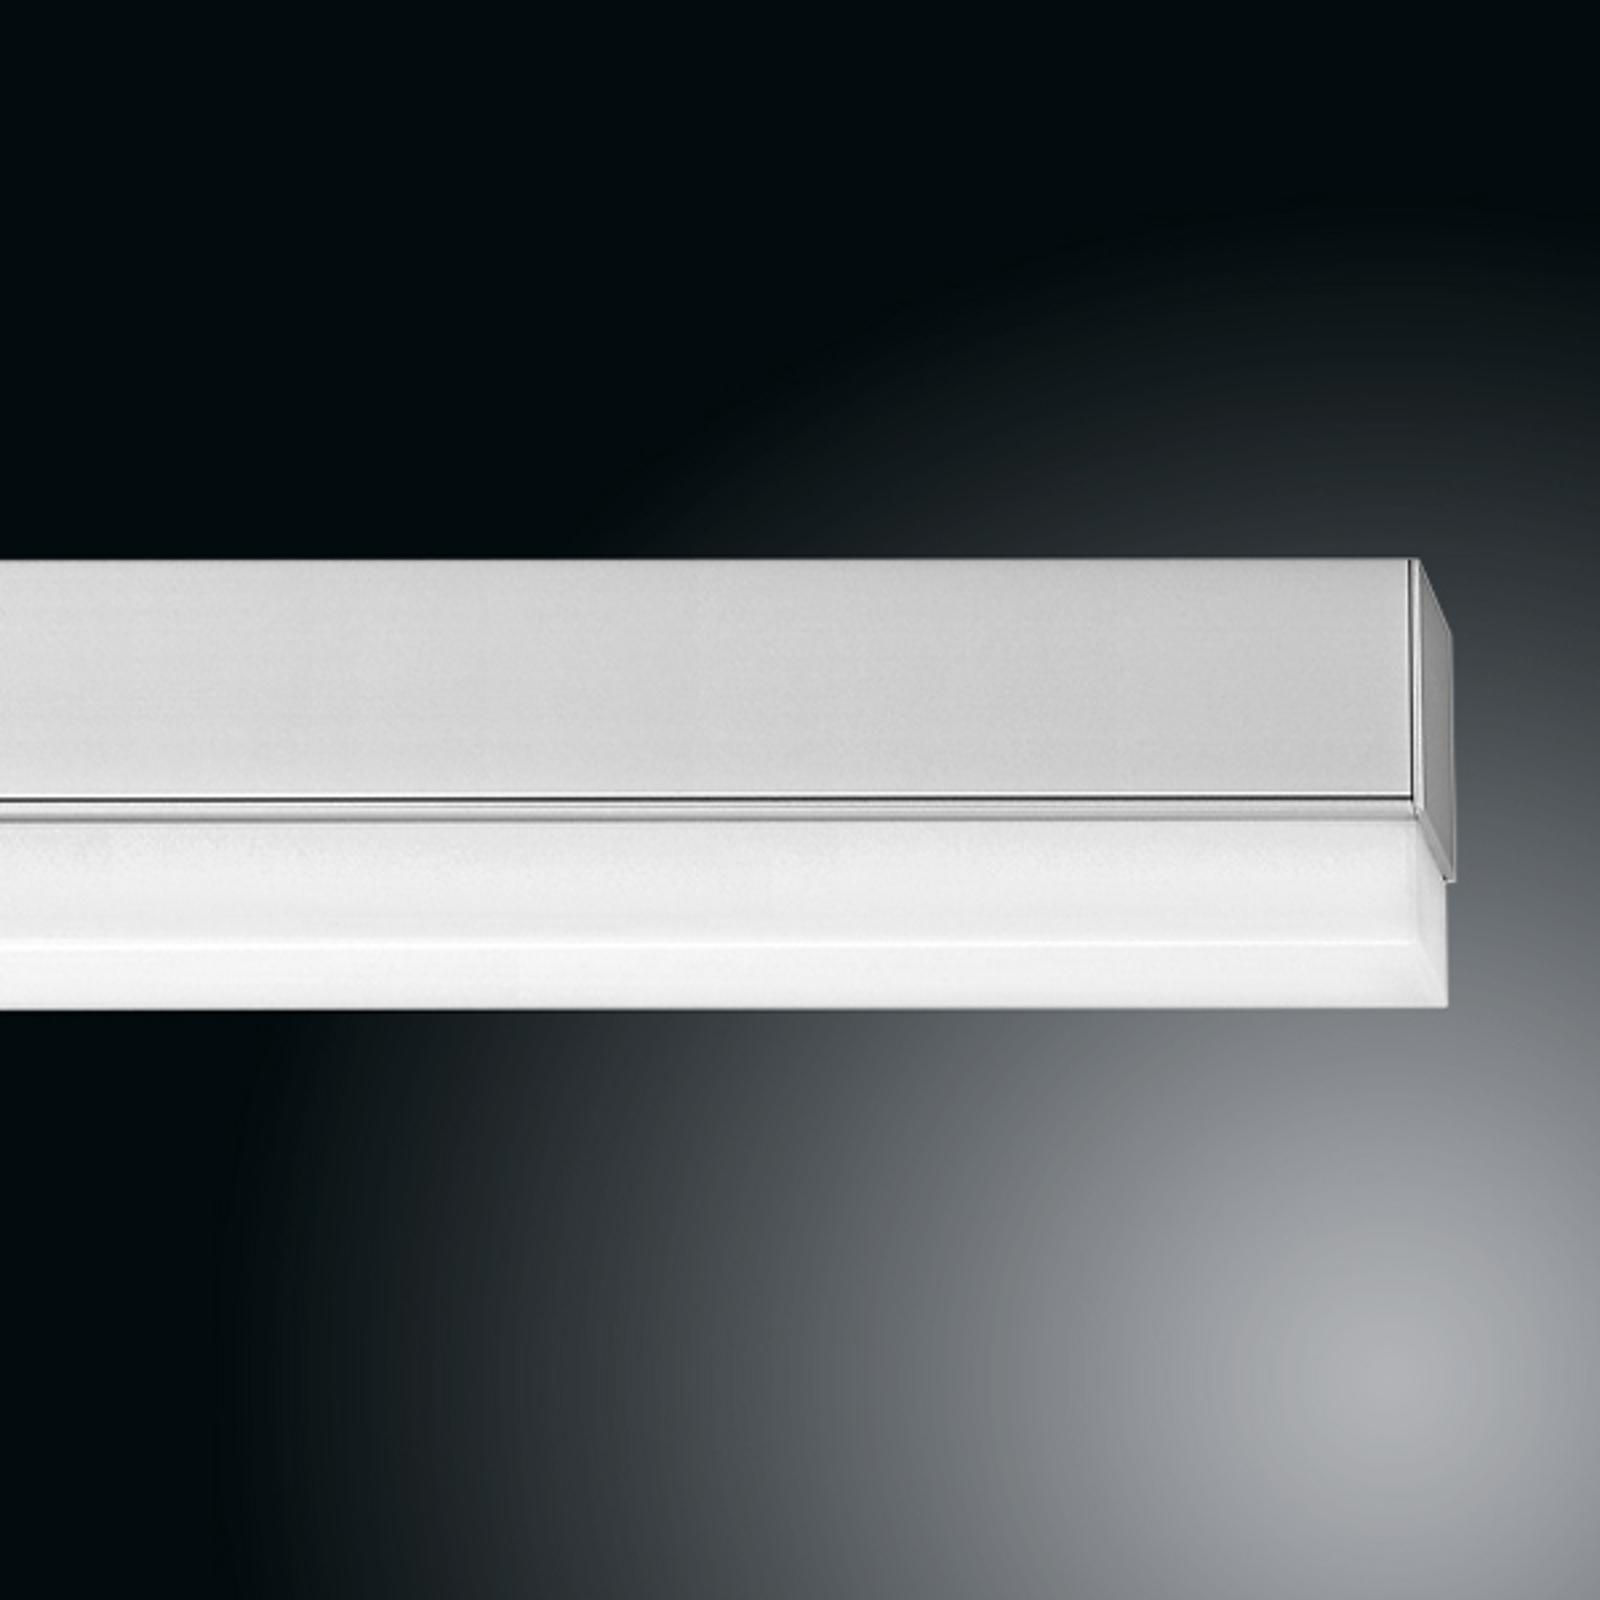 Ribag Metron LED-Deckenleuchte 90cm ww alu dimmbar